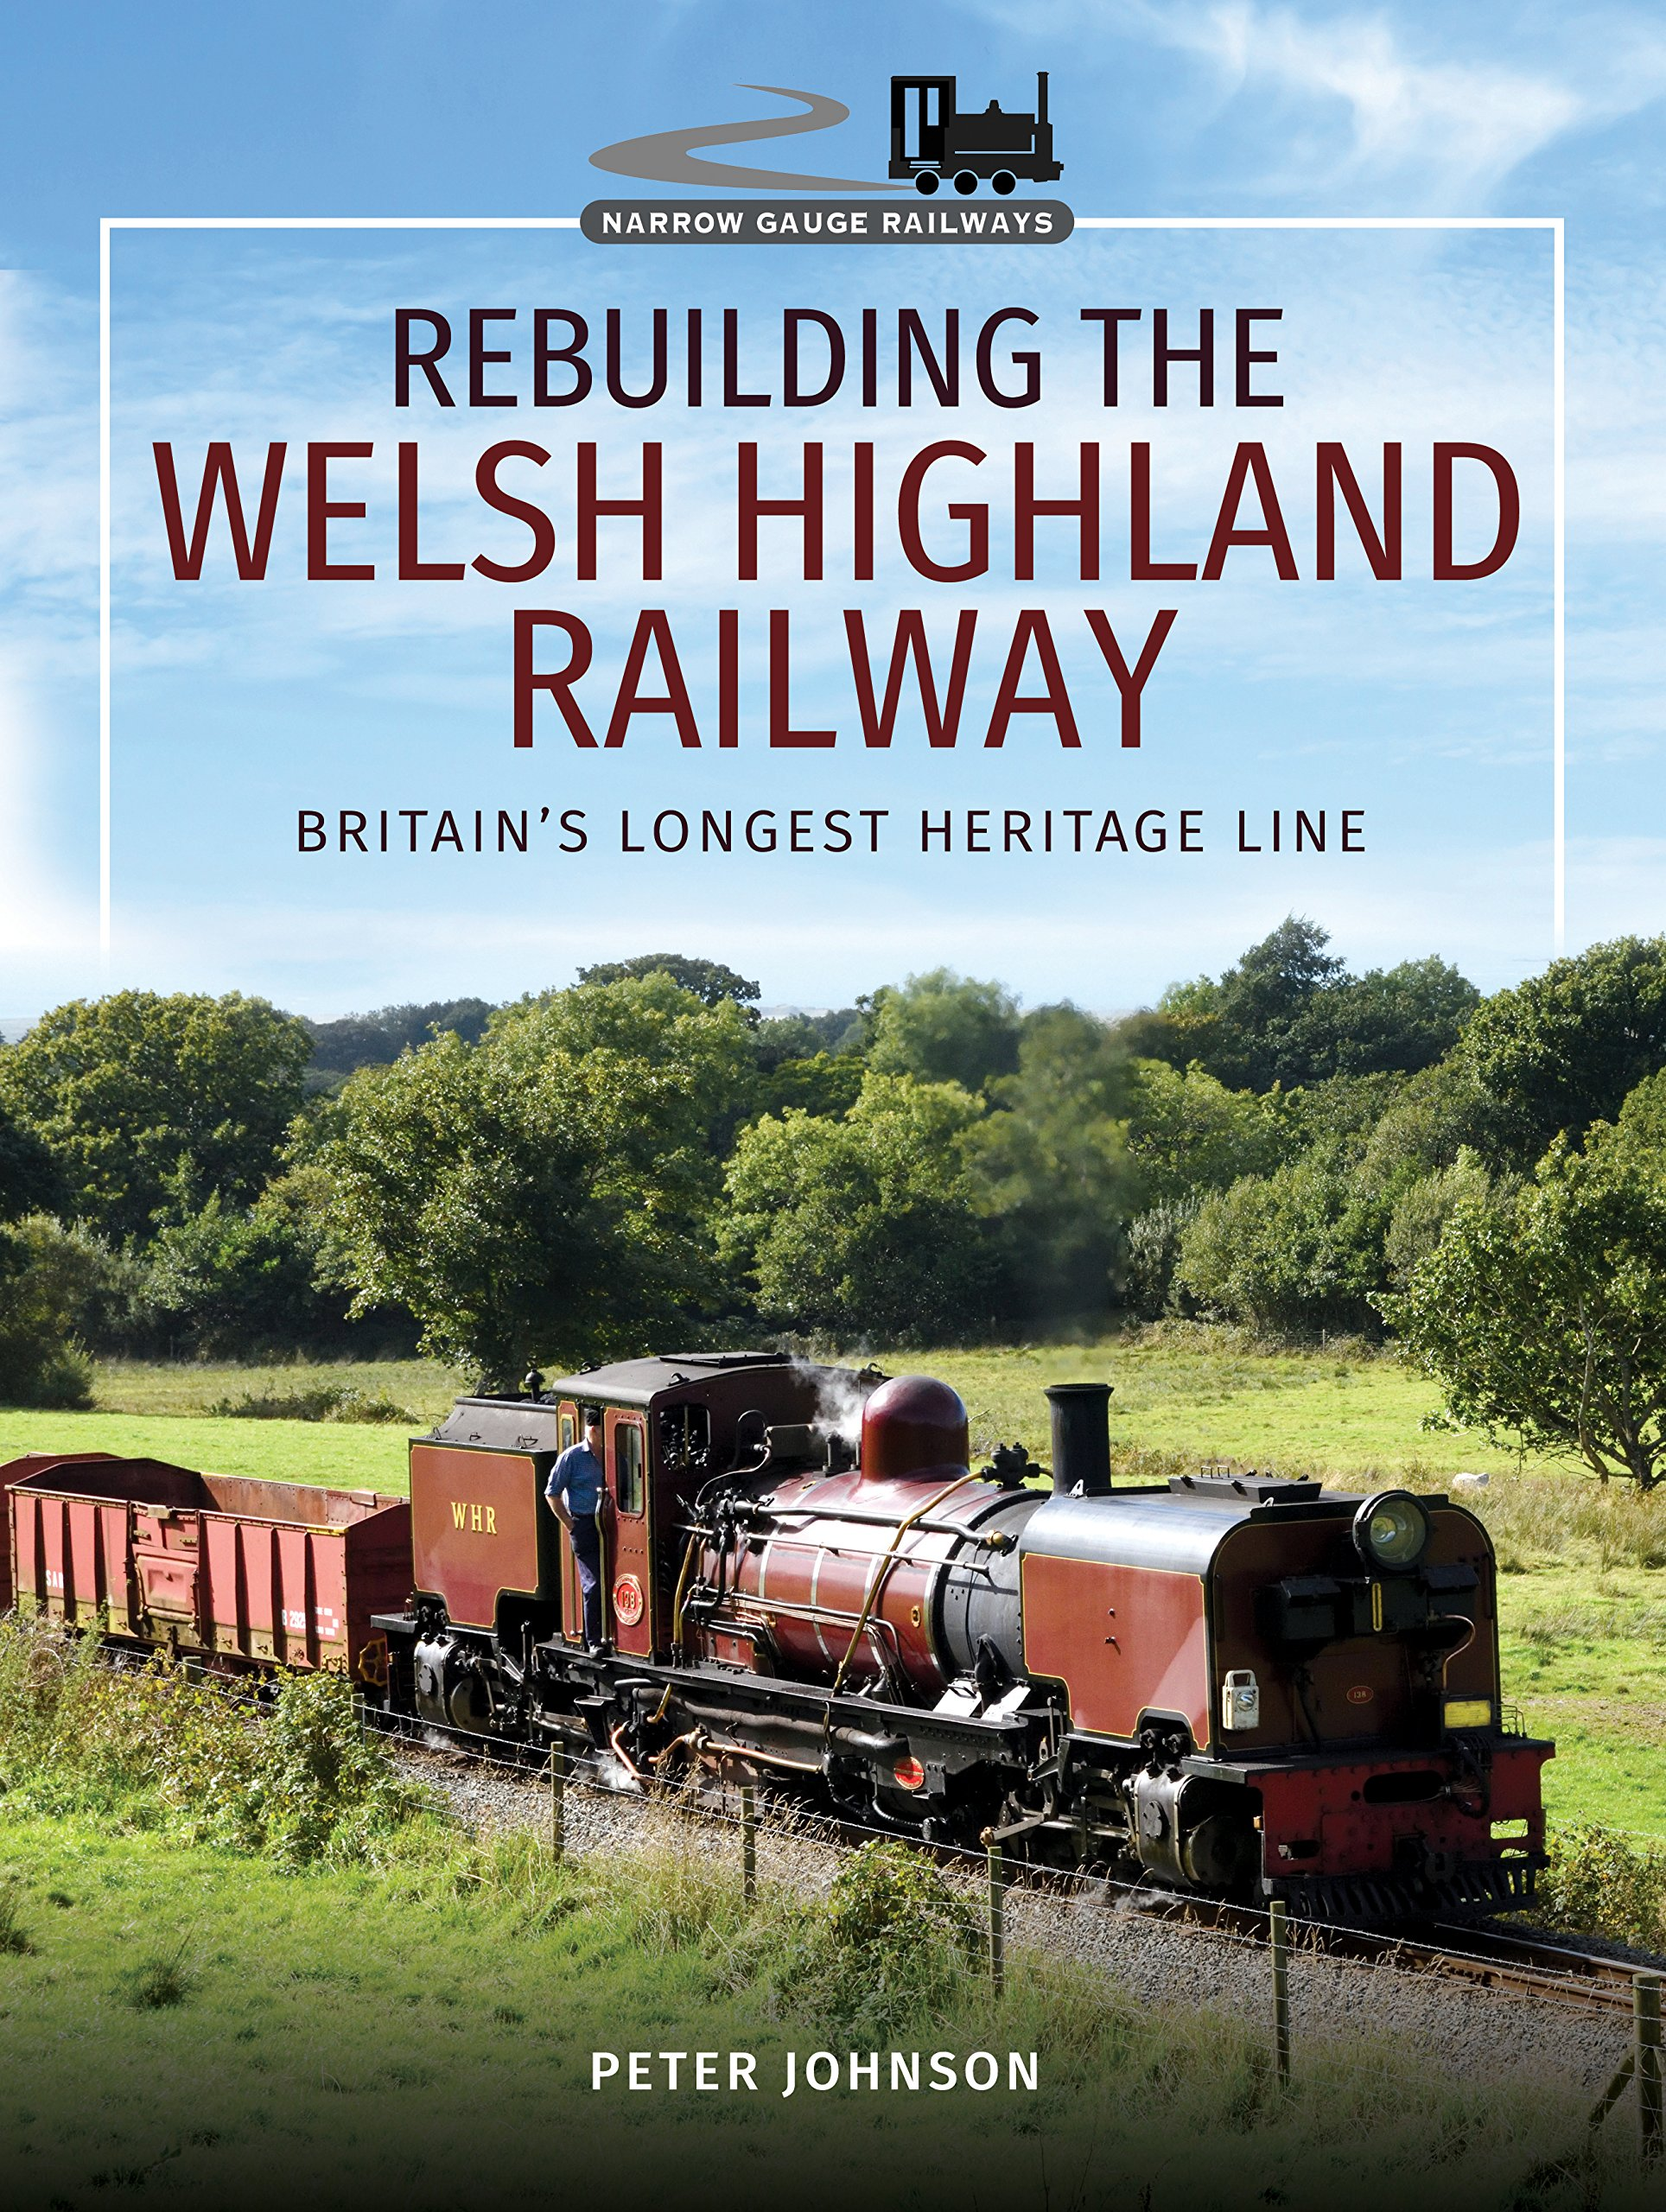 Rebuilding The Welsh Highland Railway: Britain's Longest